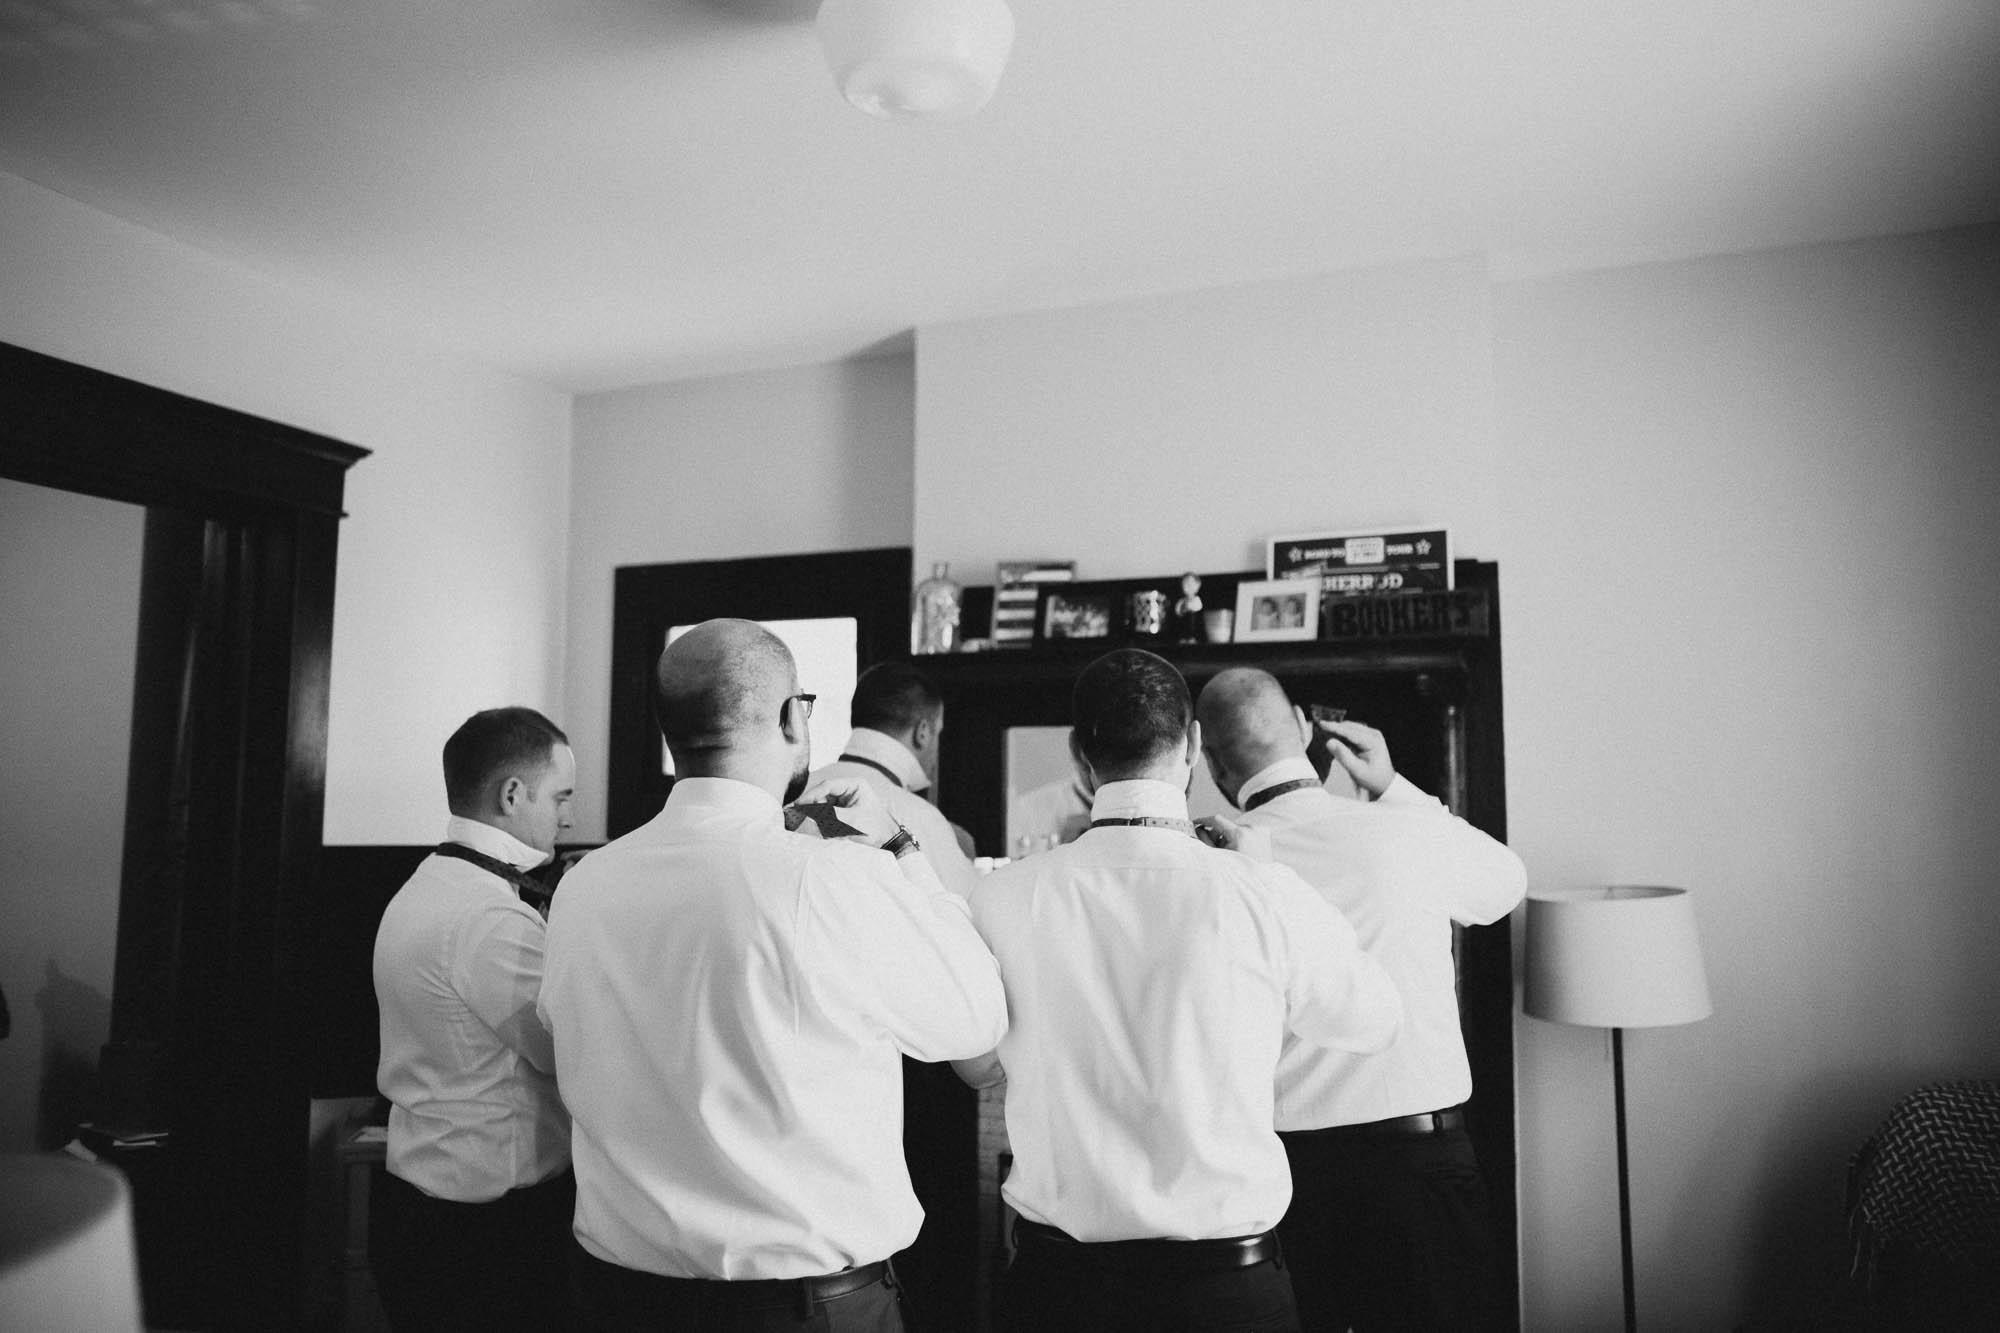 Groomsmen Tie Bow Ties Together